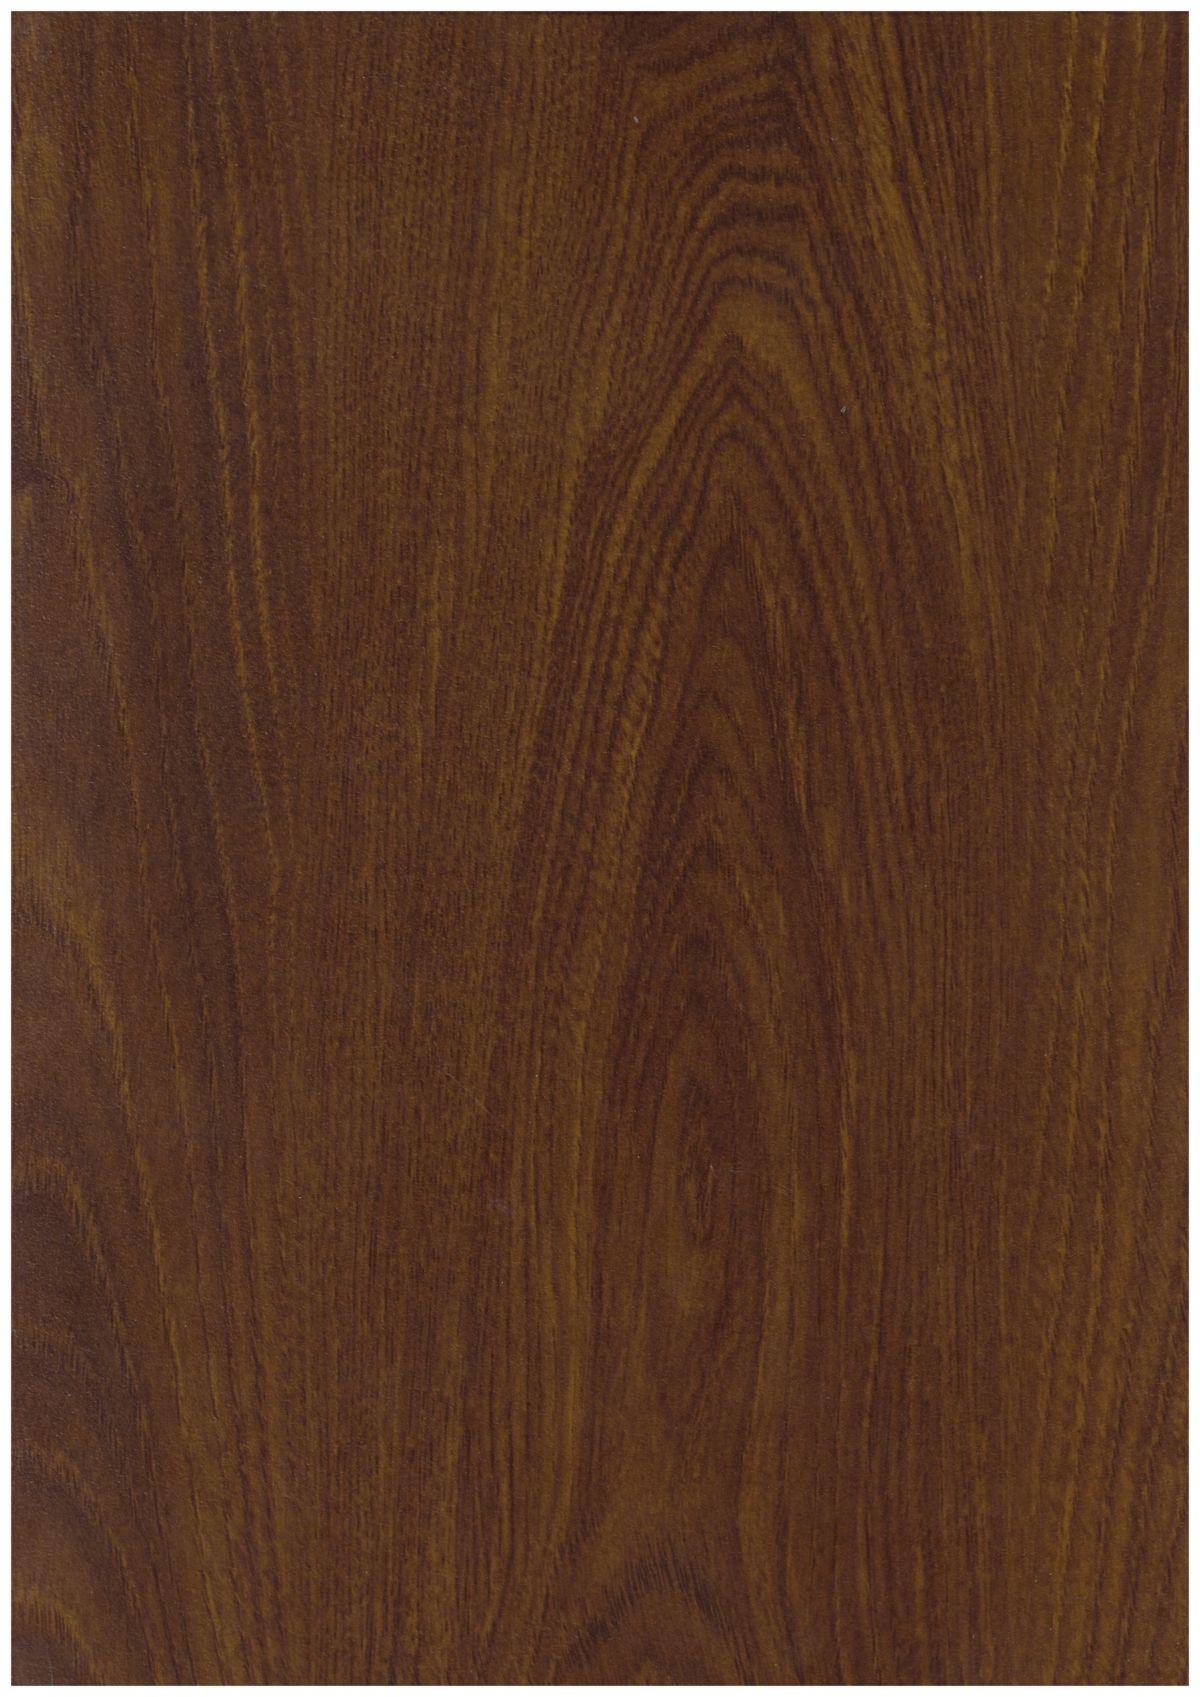 Dark Coloured Wood